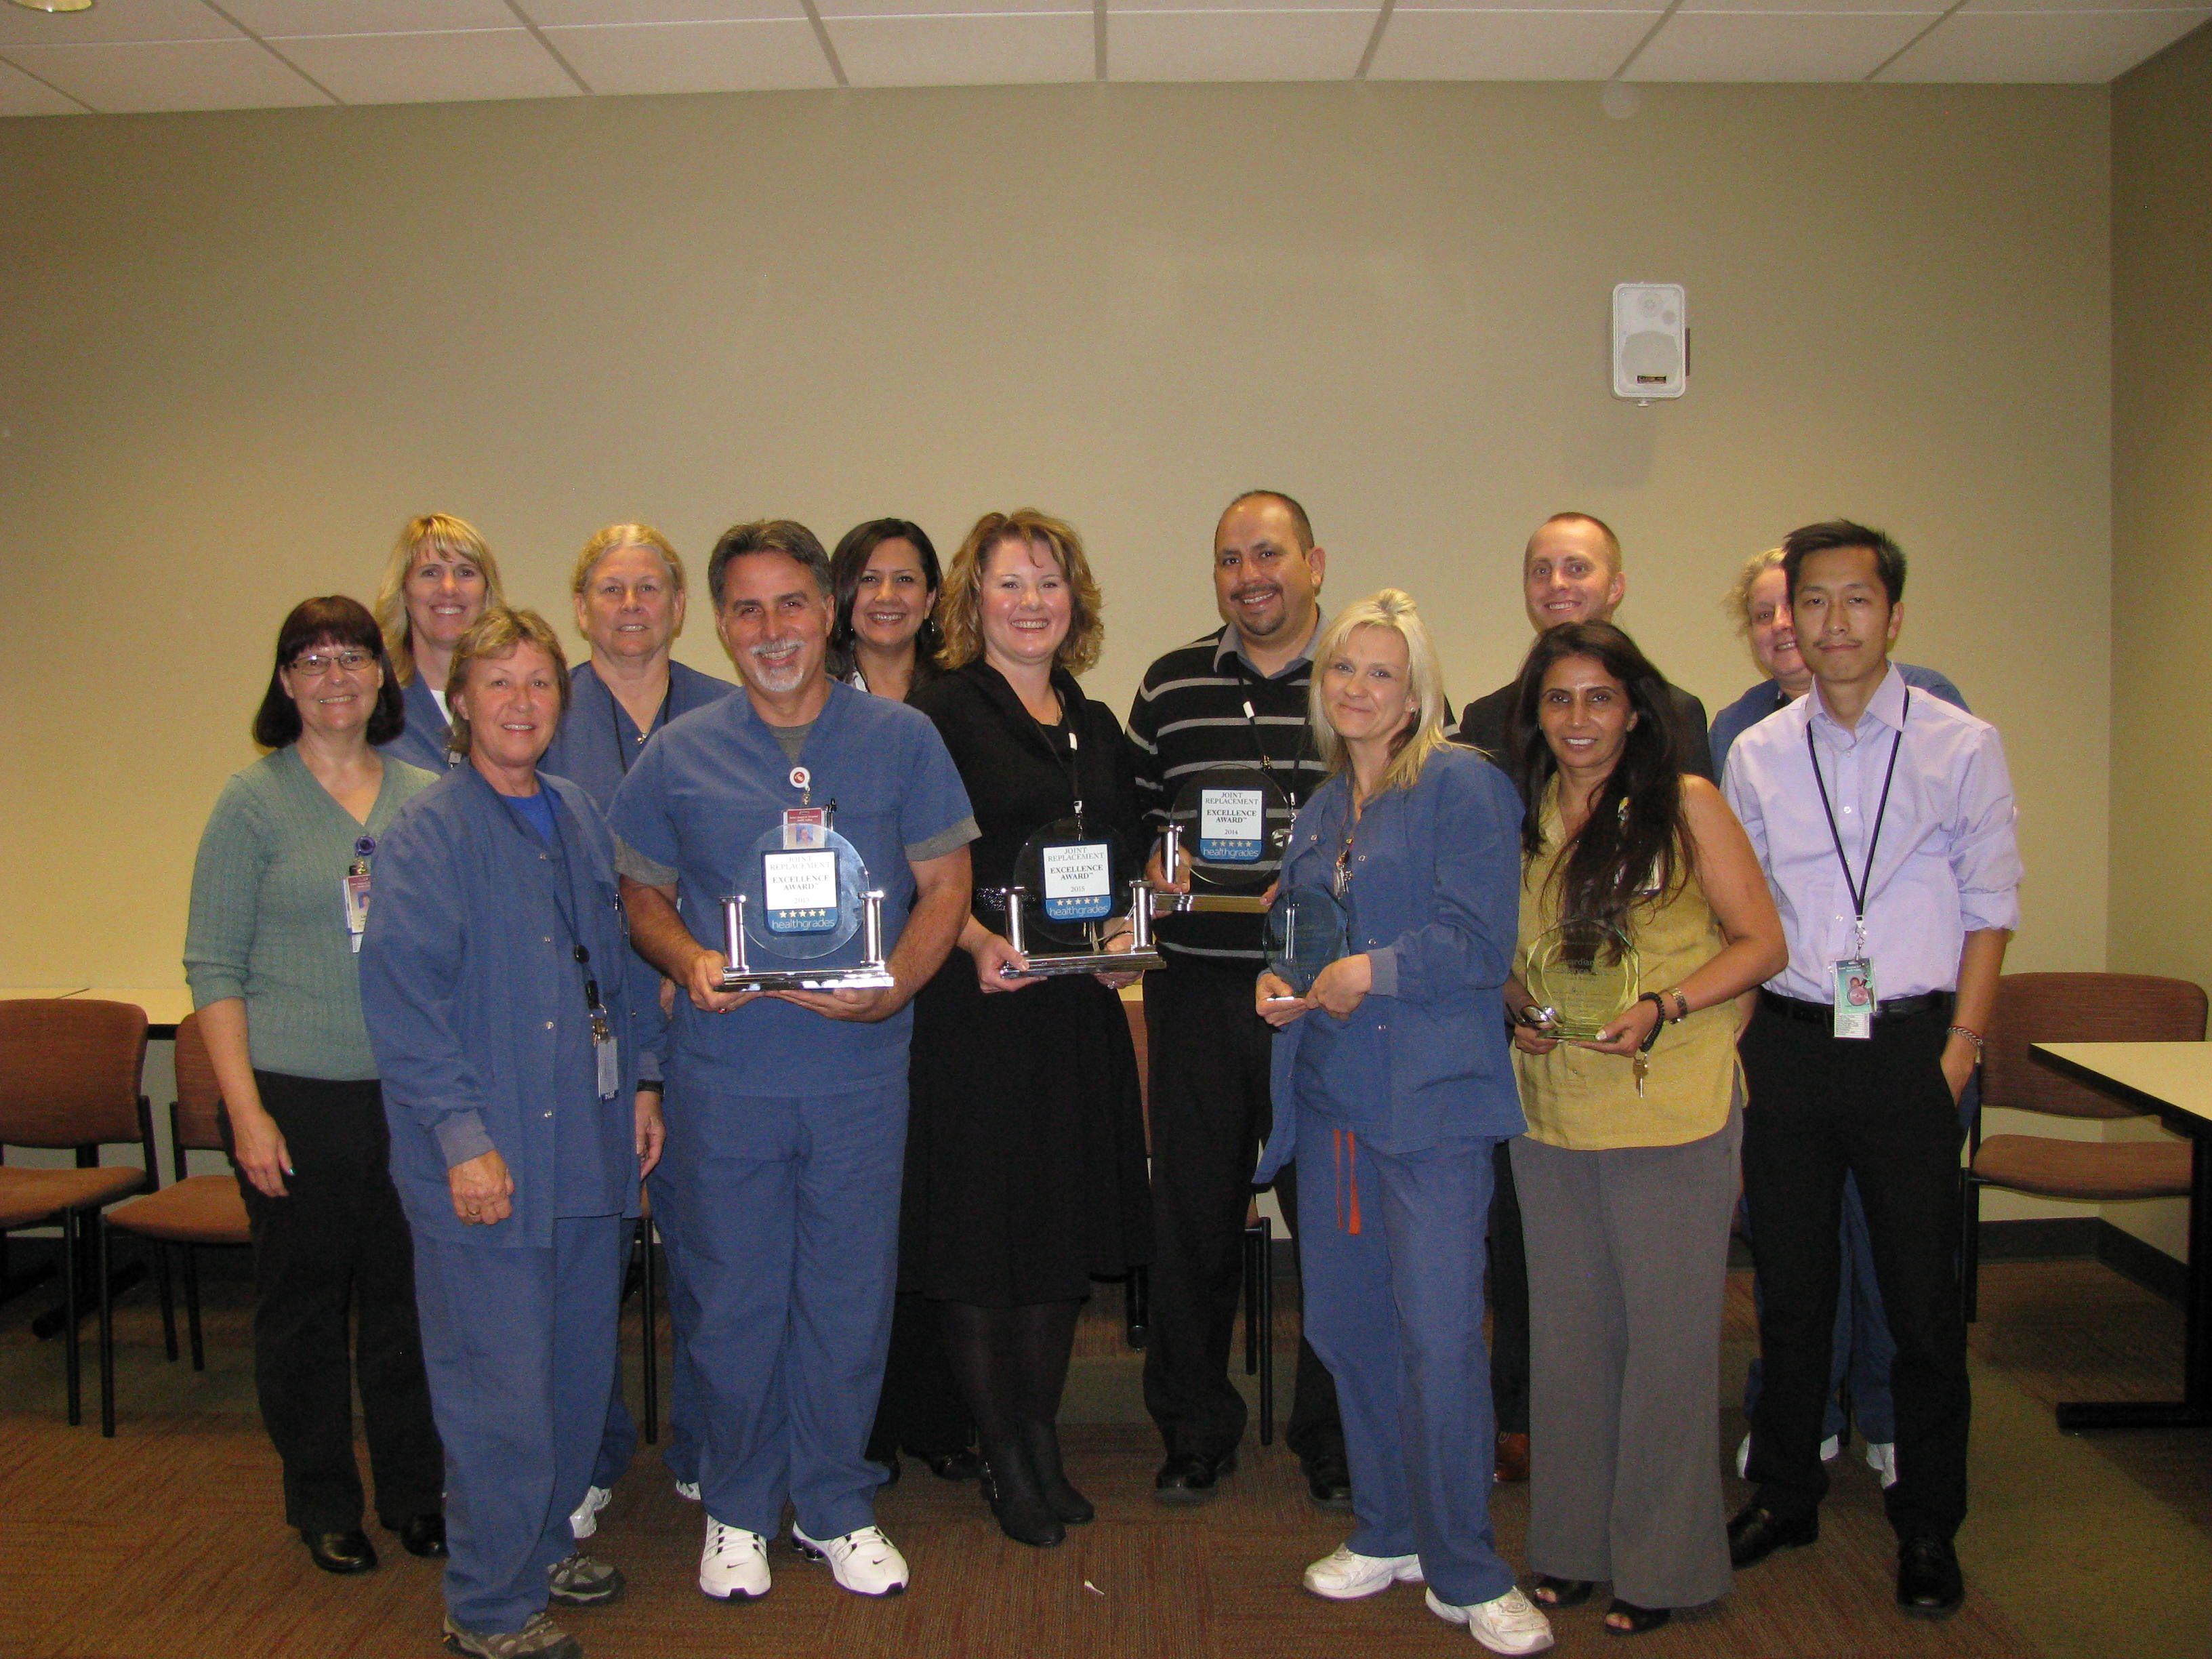 Healthgrades presented Sutter Surgical Hospital North